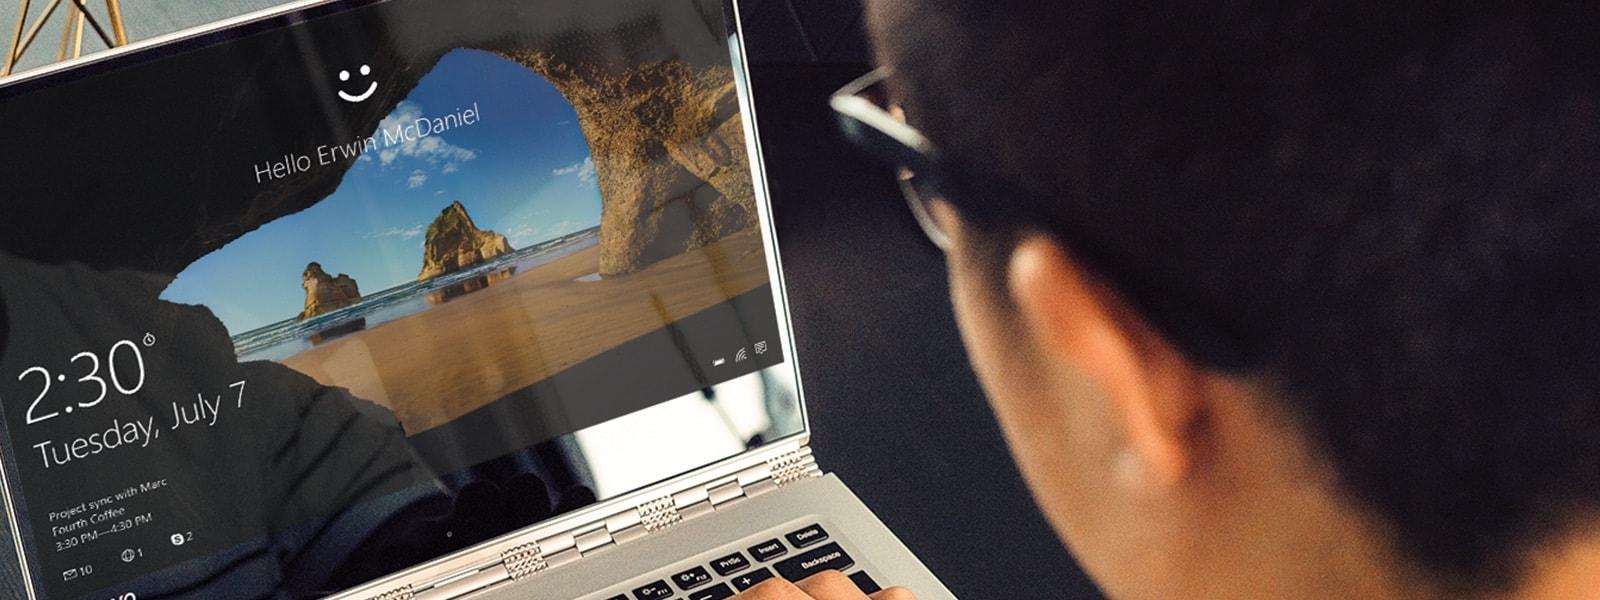 Man signs into laptop using Windows Hello